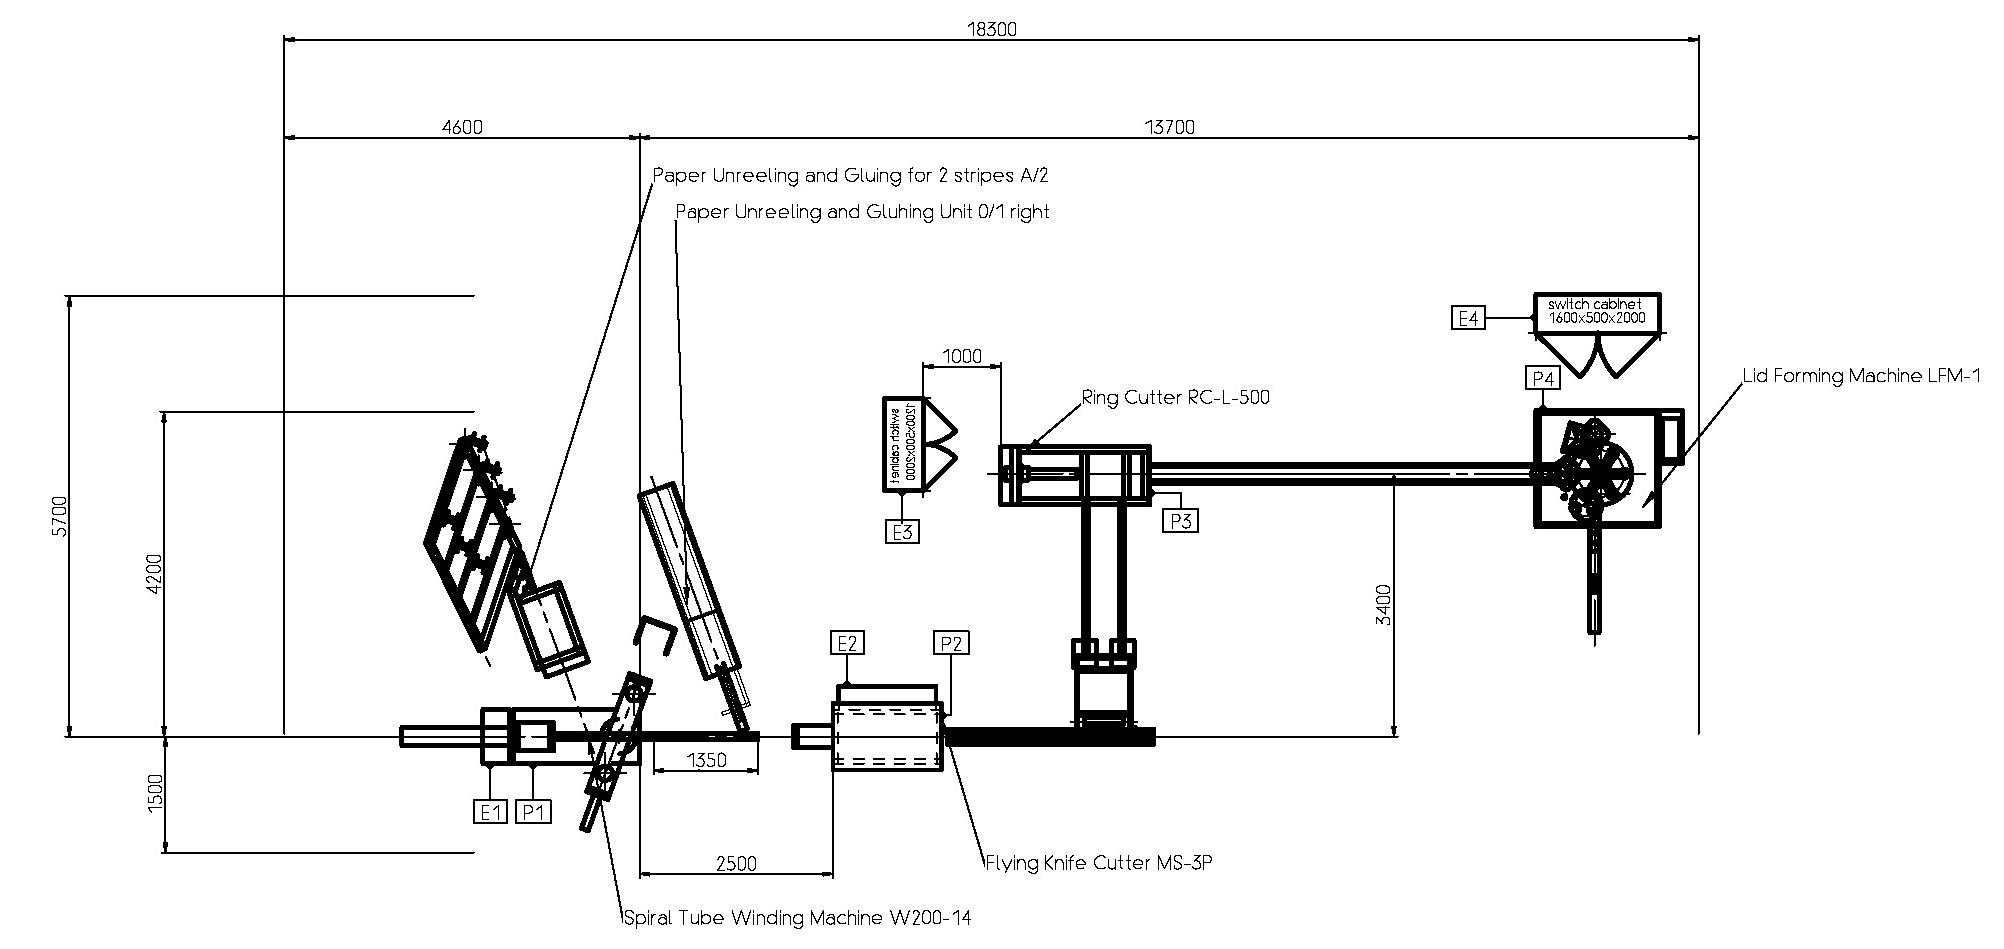 Deckelformmaschine Lfm 1 Fur Eiskremedeckel Majer